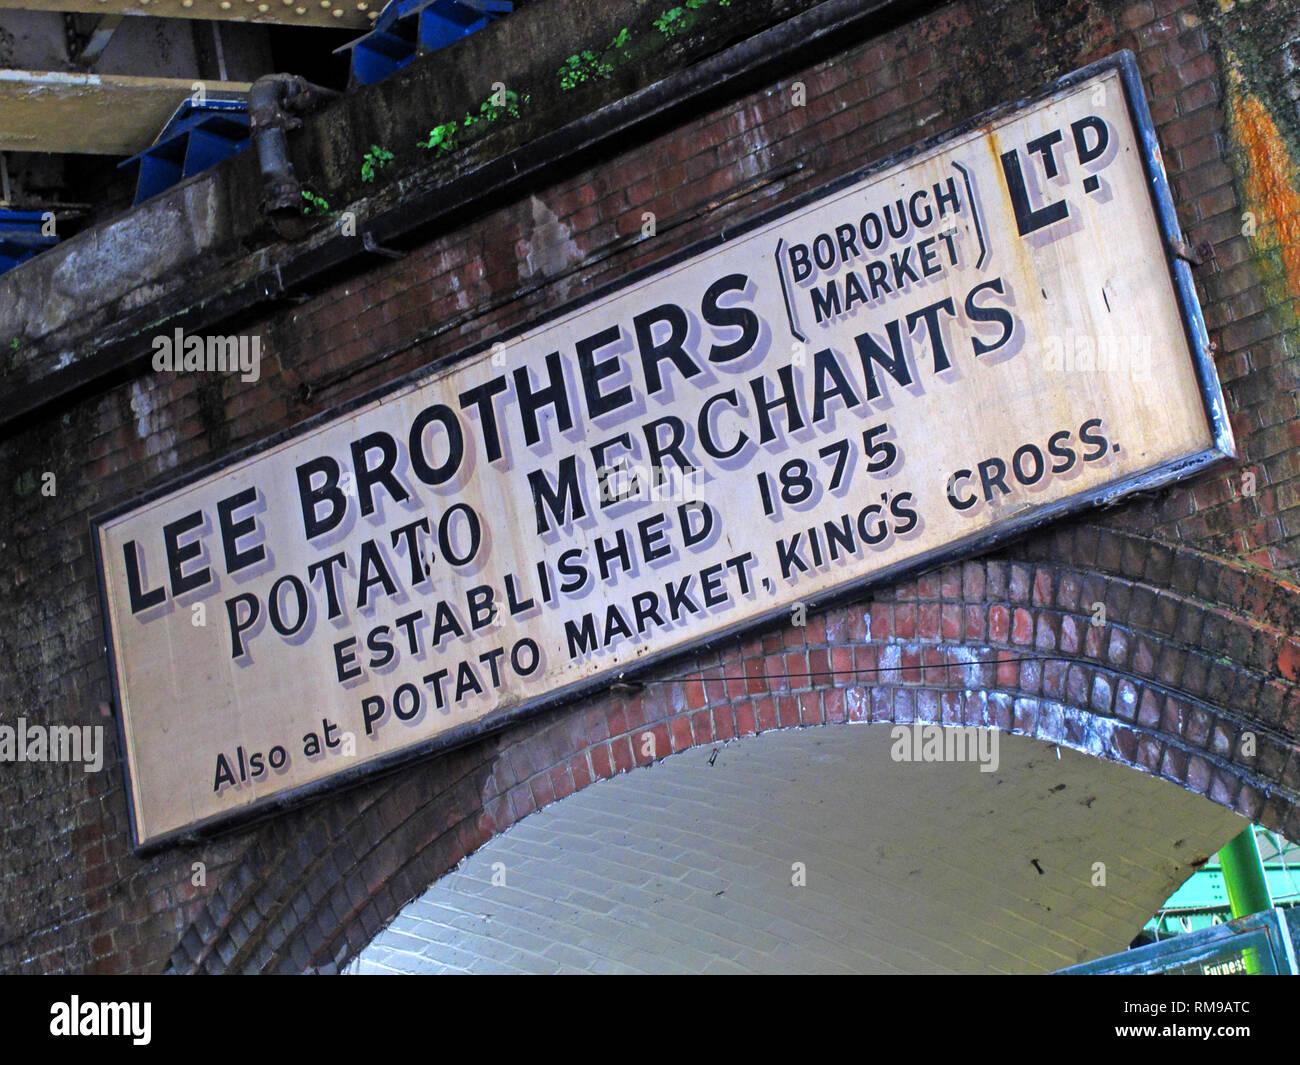 Lee Brothers, Borough Market, Potato Merchants sign (established 1875, Southwark, London, South East England, UK, - Stock Image